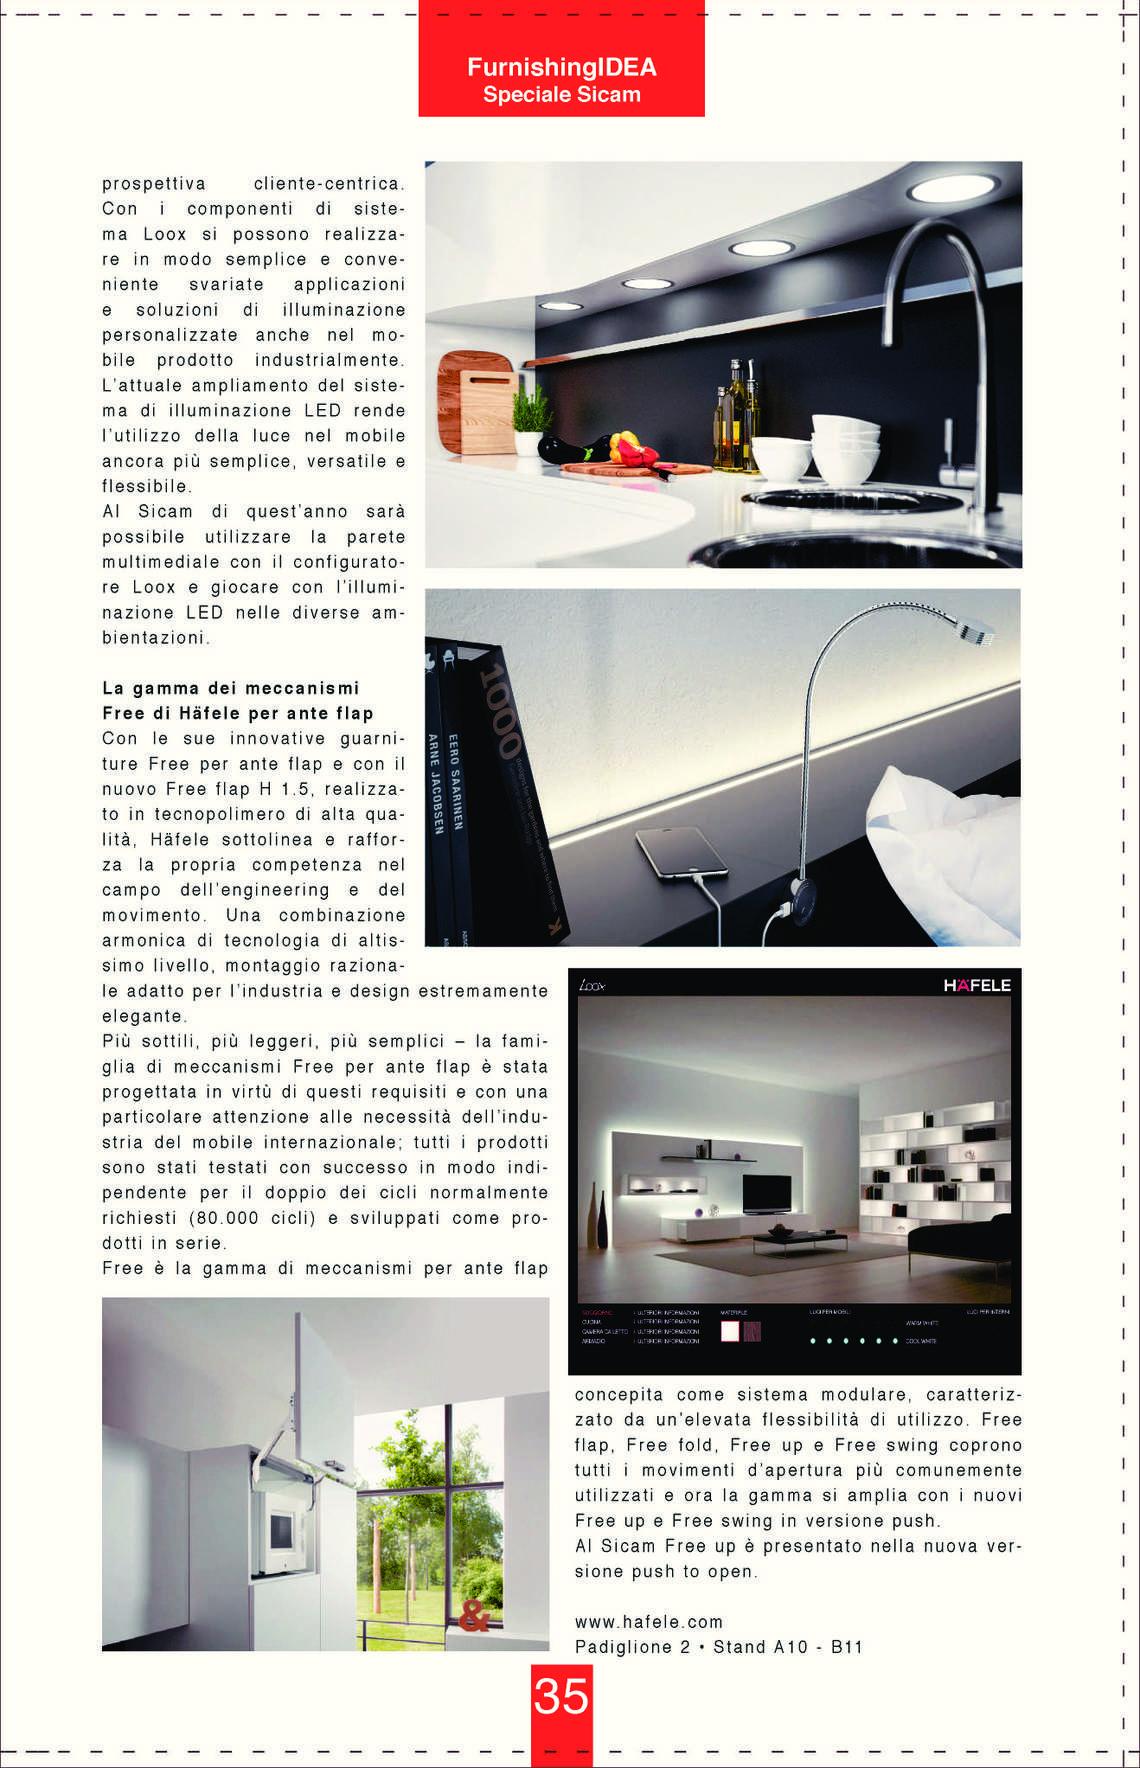 sicam-2016_journal_4_034.jpg